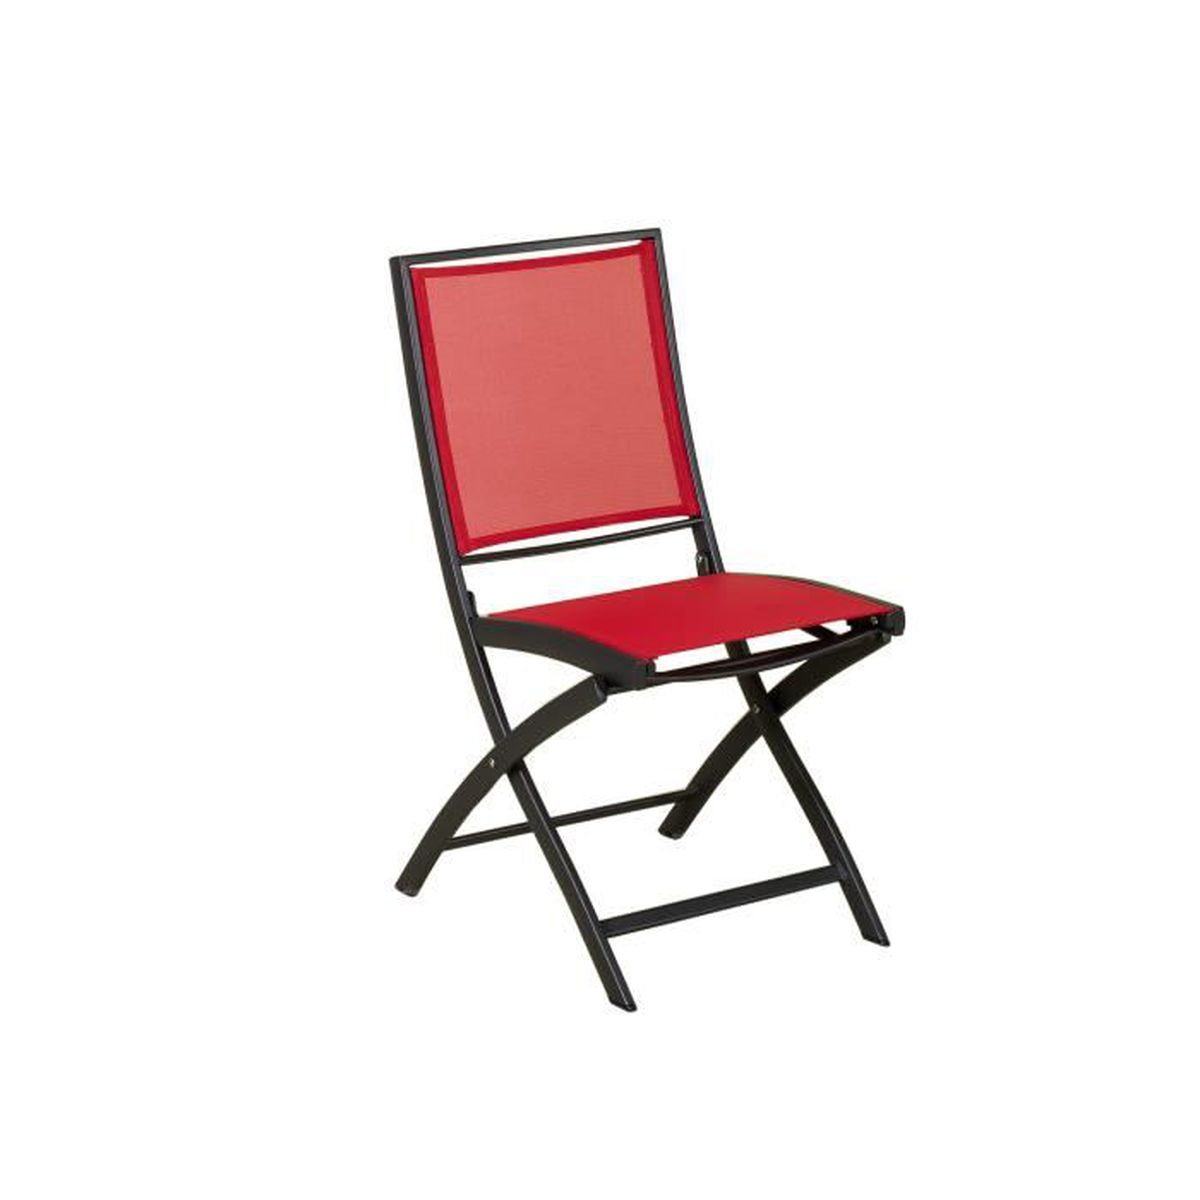 chaise salon de jardin toile